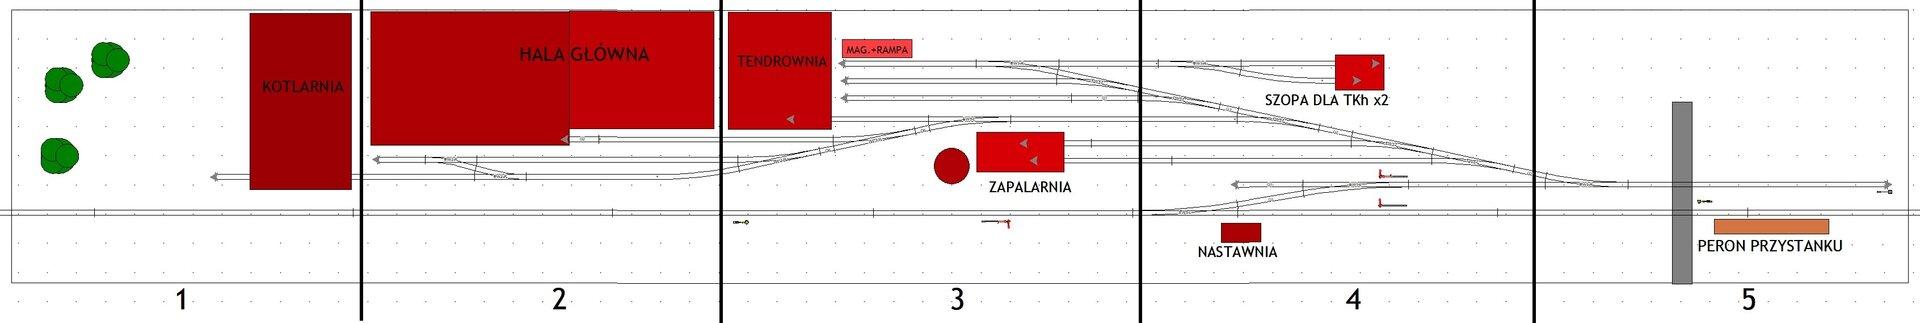 zntk-v4-1.jpg